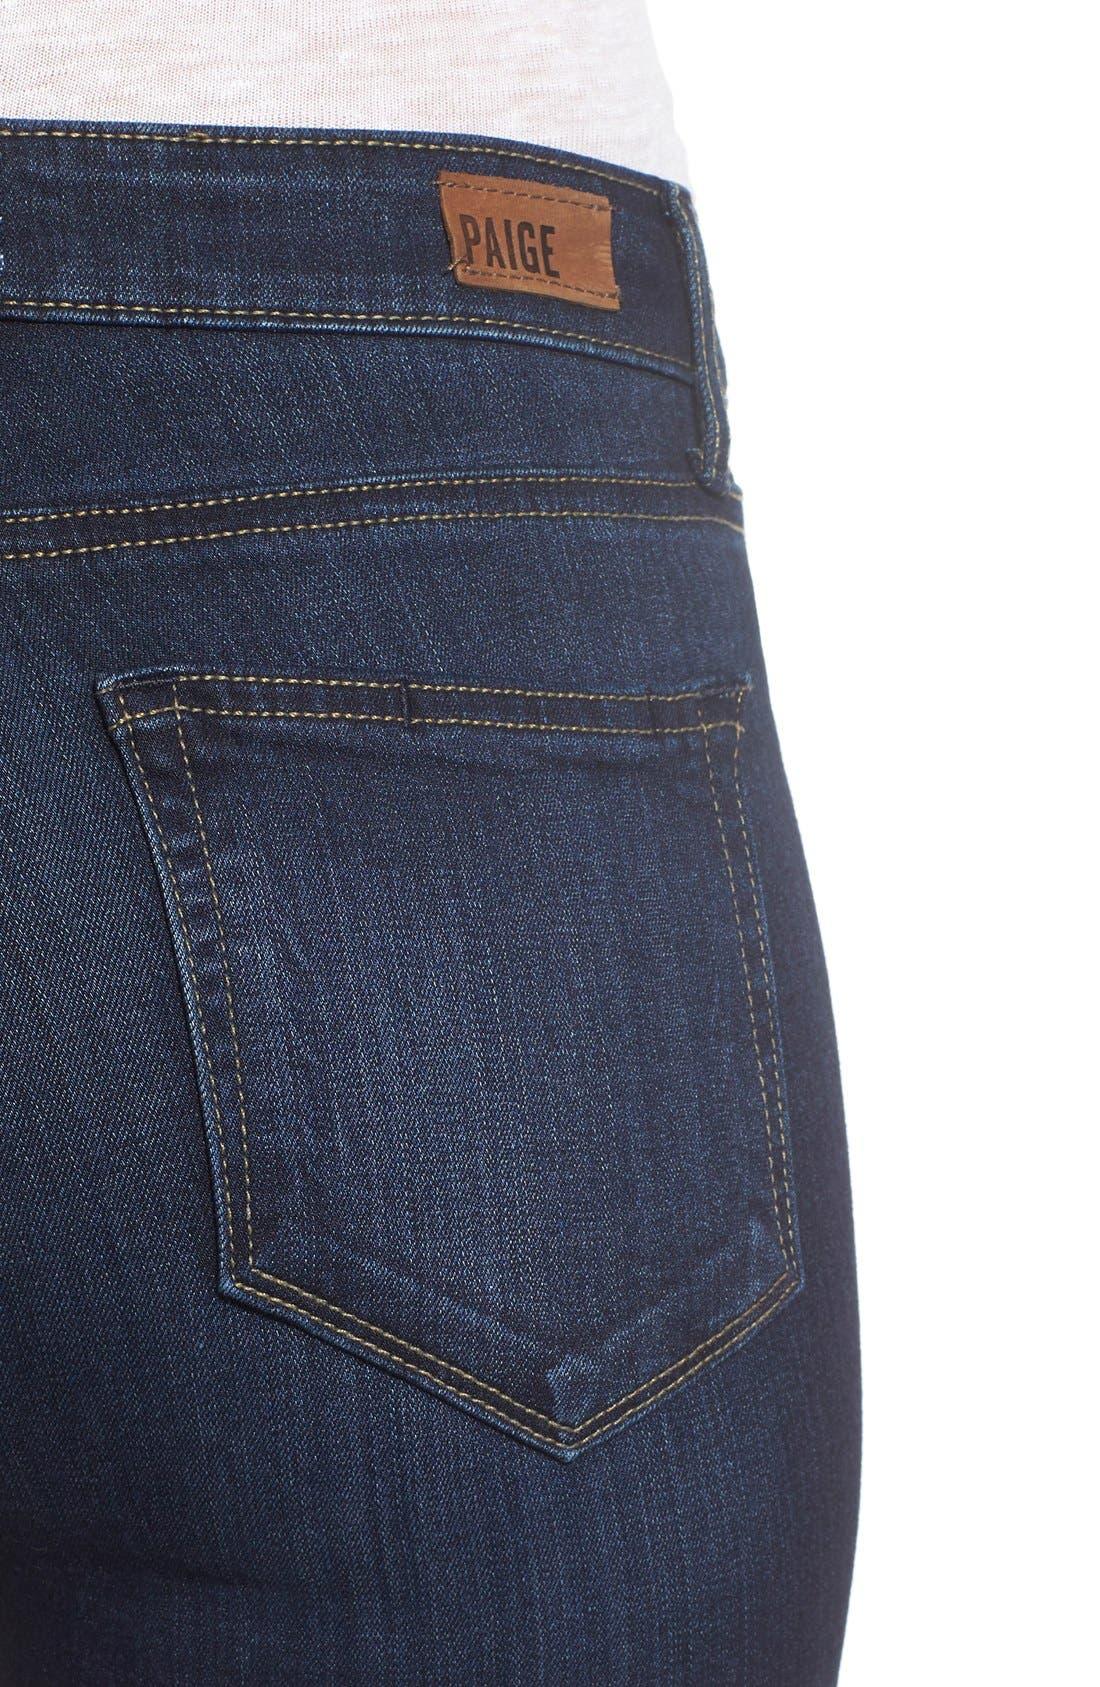 Transcend - Hoxton High Waist Ankle Ultra Skinny Jeans,                             Alternate thumbnail 2, color,                             HARTMANN